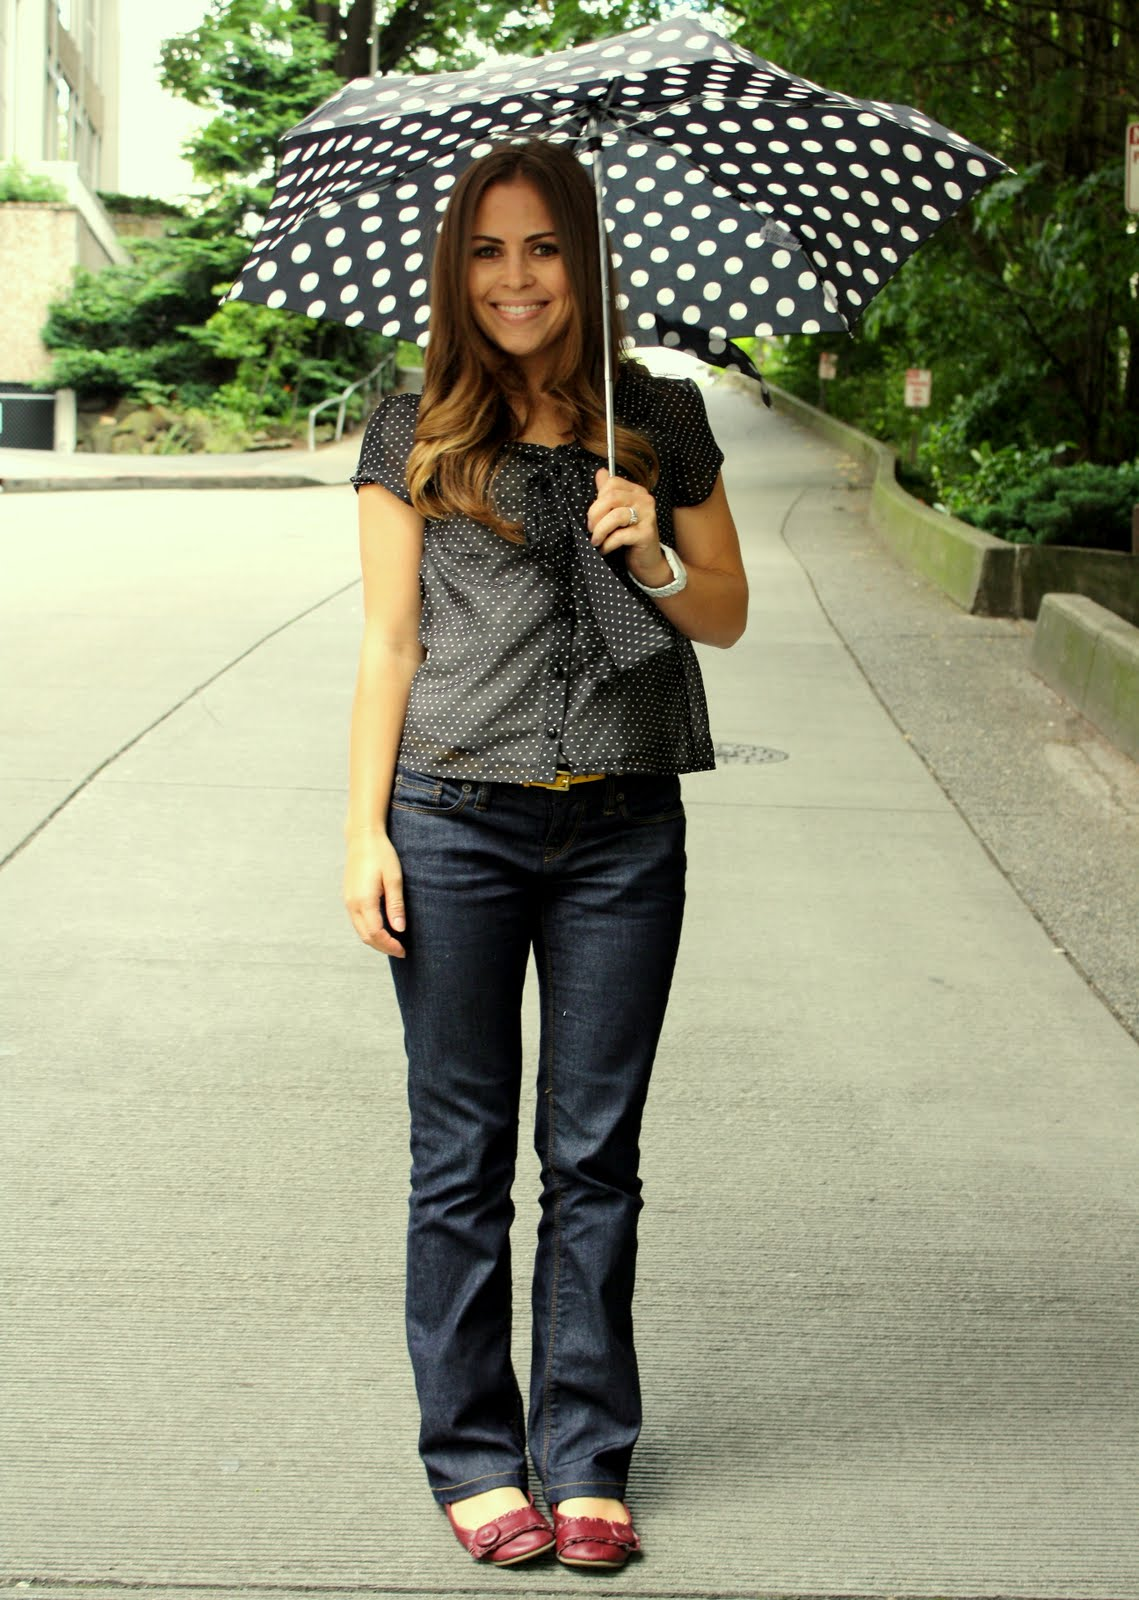 4c49fc2061 Jeans  The Loft. Polka Dot blouse  H M. Belt